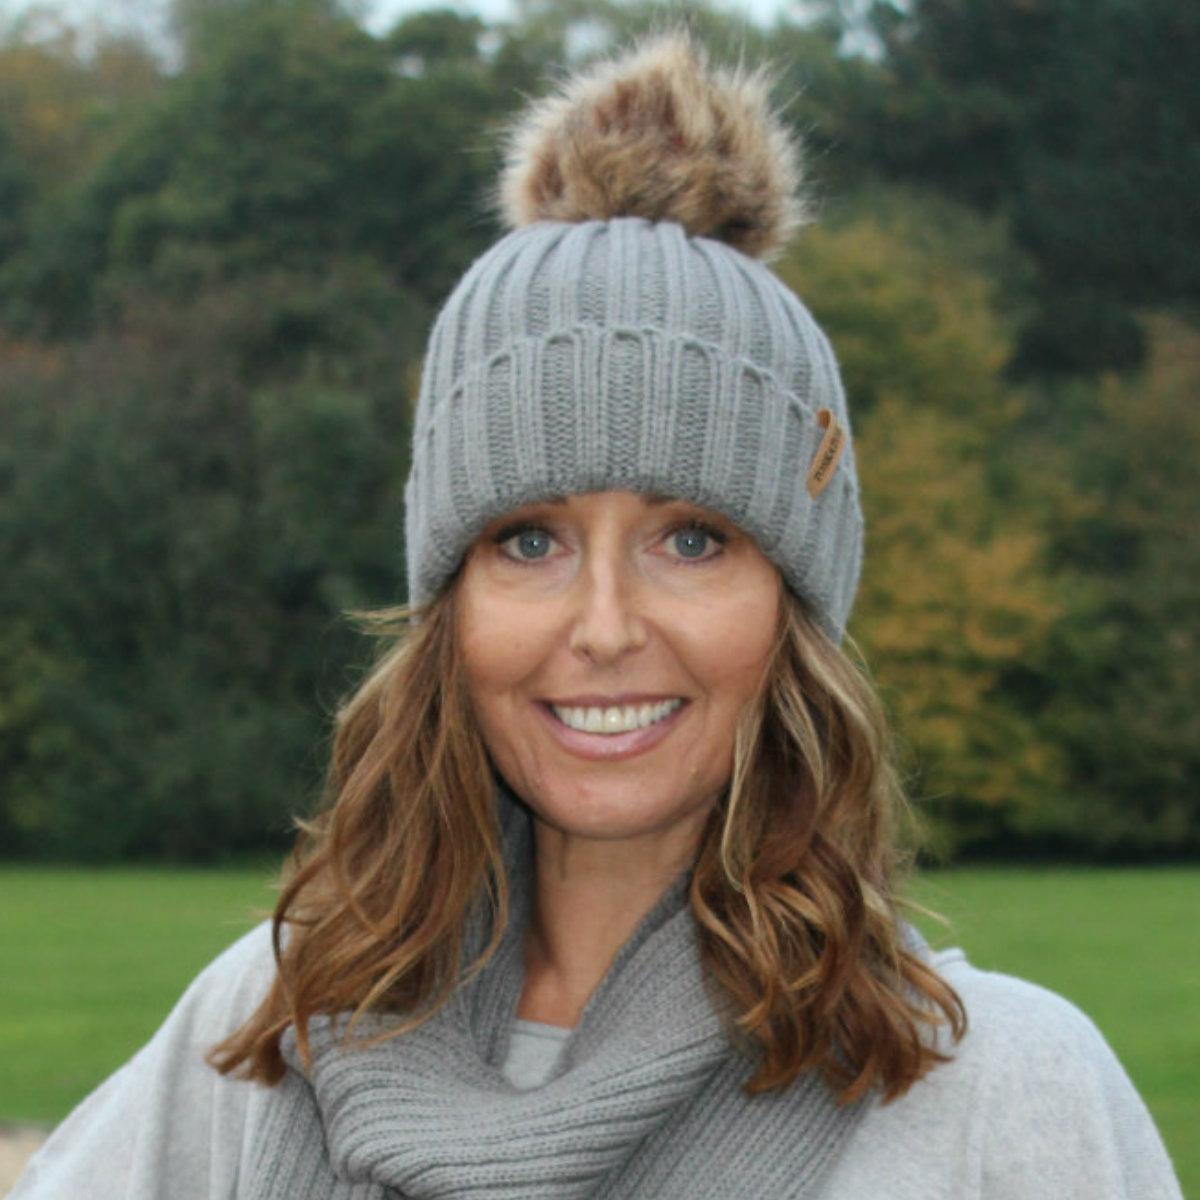 5ffcd2a3ac0 Ribbed Beanie Hat With Faux Fur Pom Pom (Grey) – Muddy-Footprints